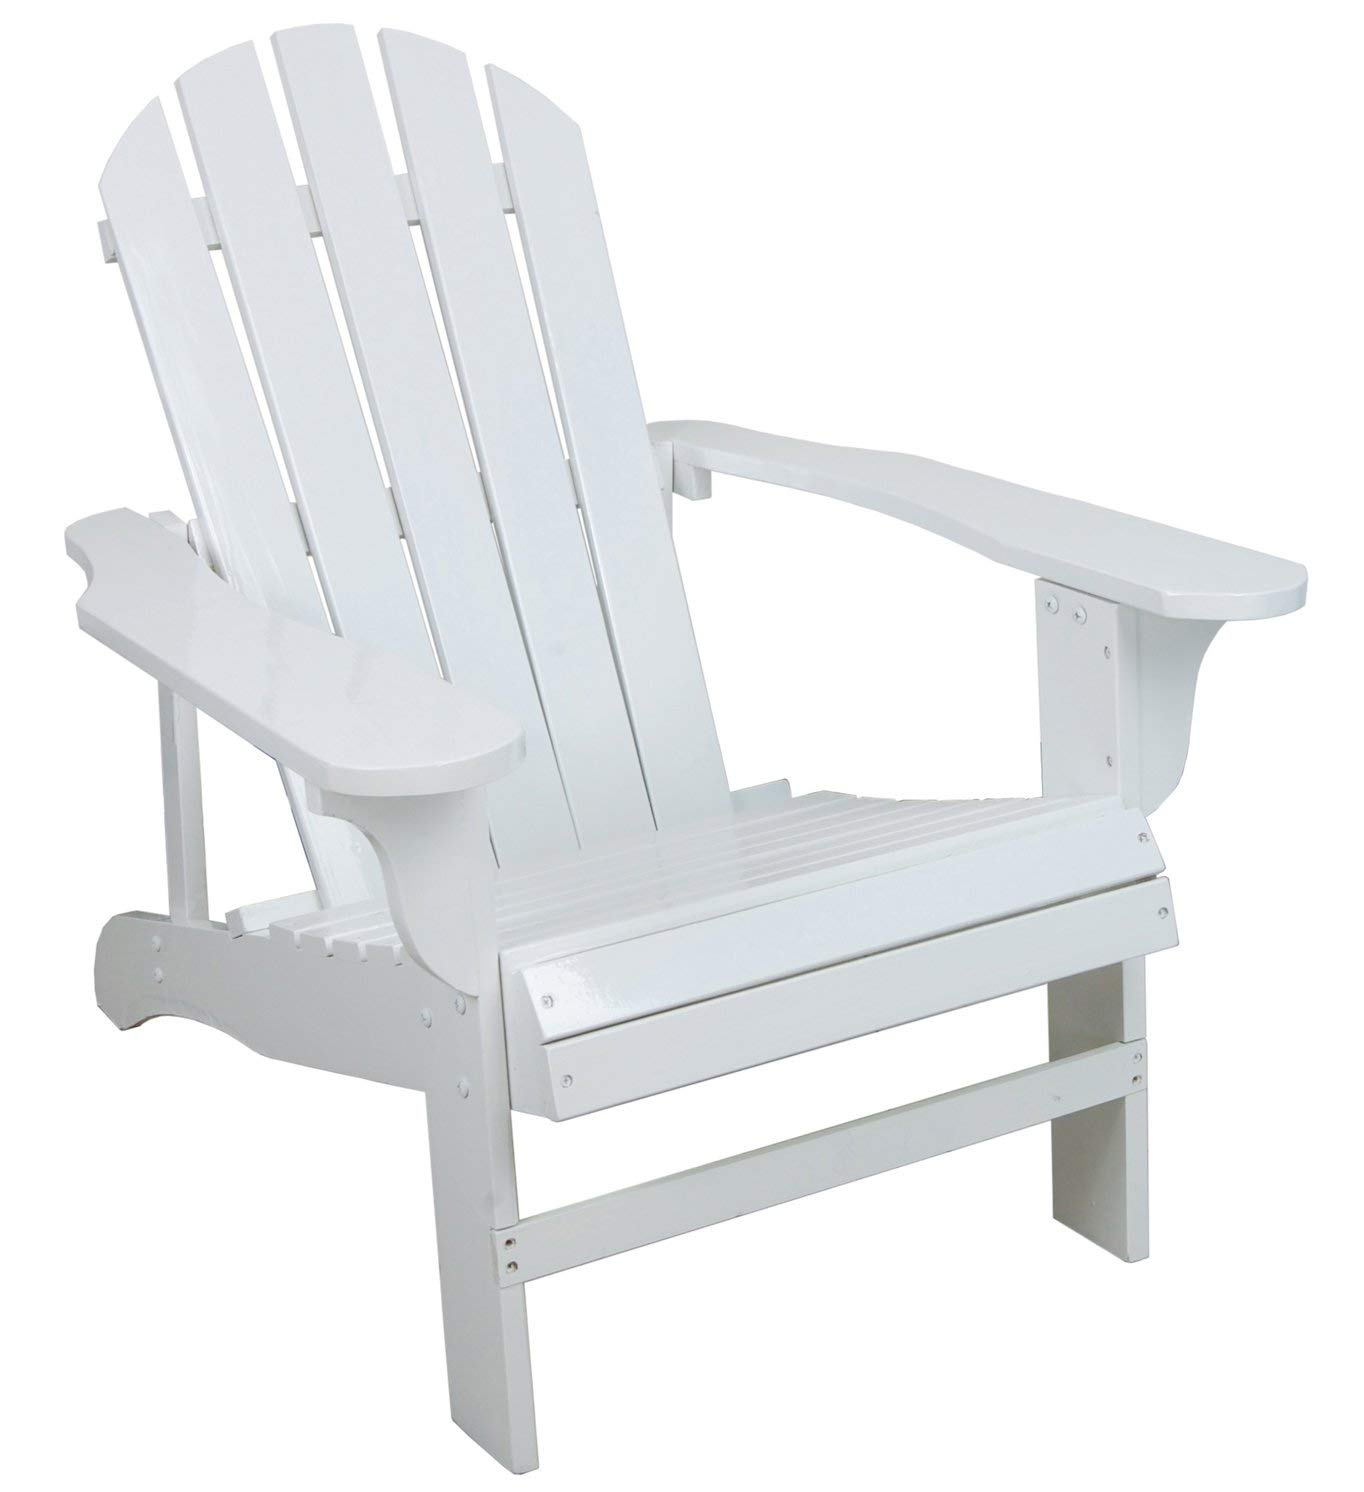 adirondack chairs amazon.com : classic white painted wood